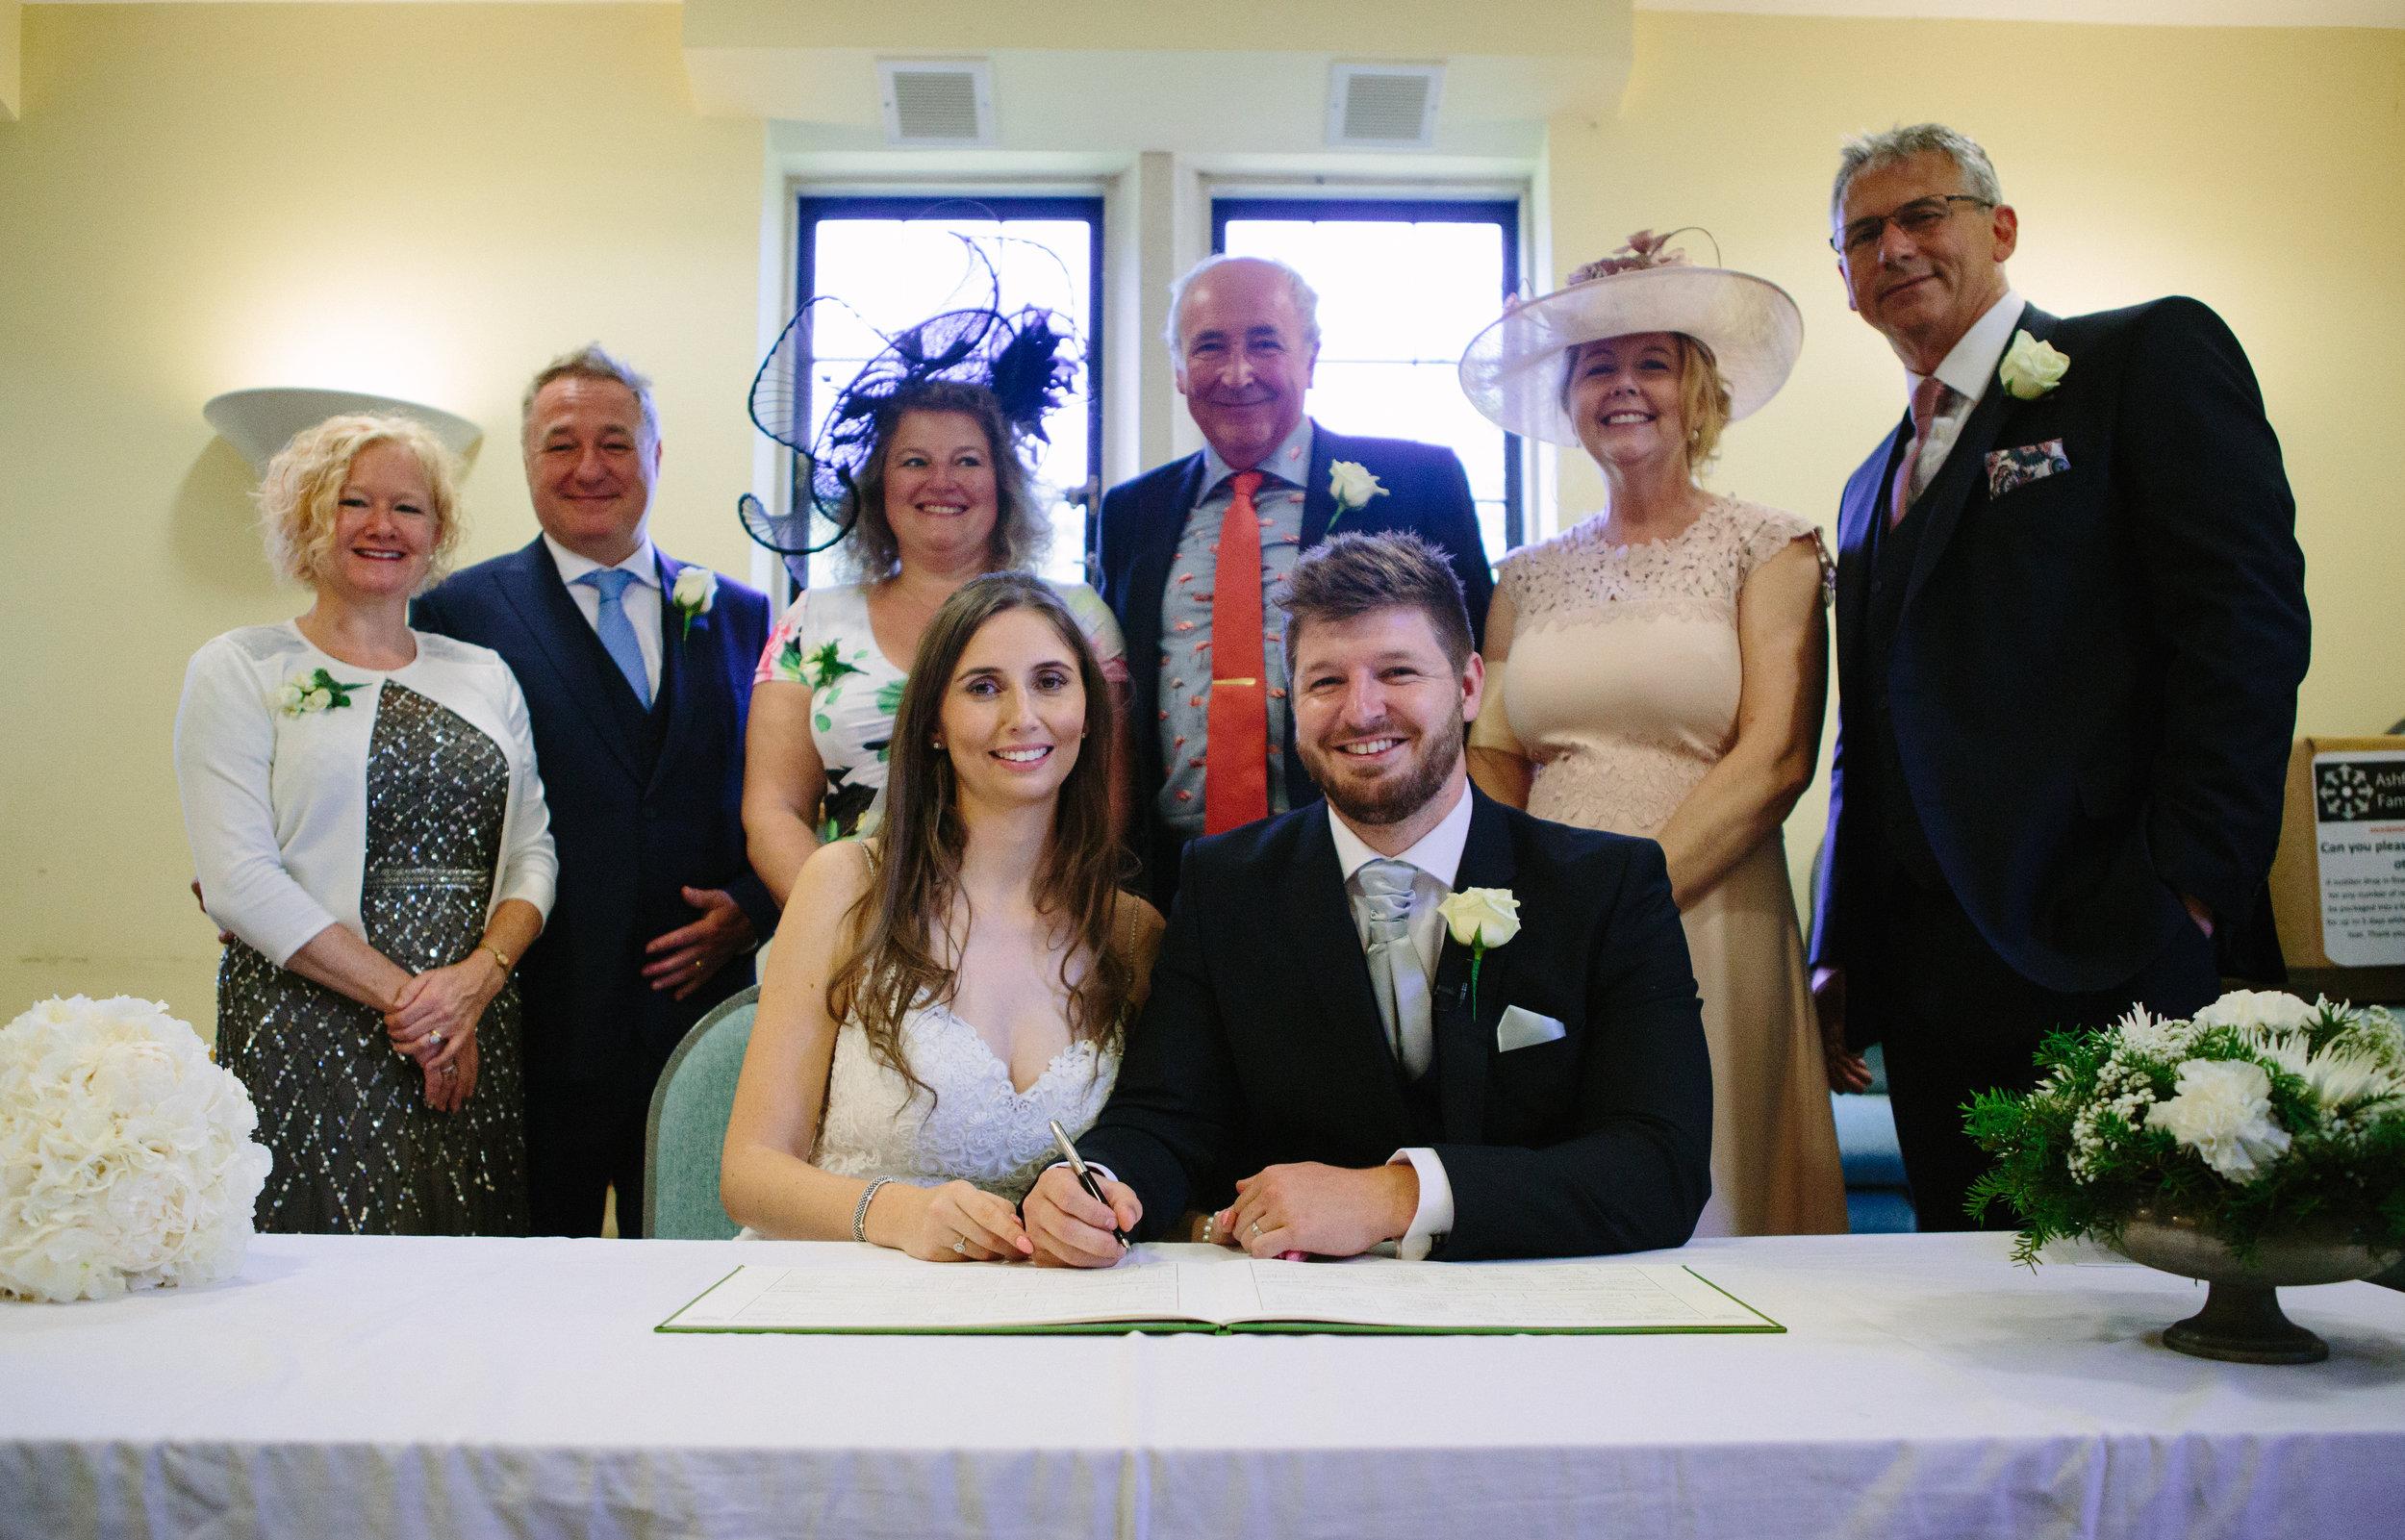 kent-wedding-photography-kingsnorth-signing-register-41